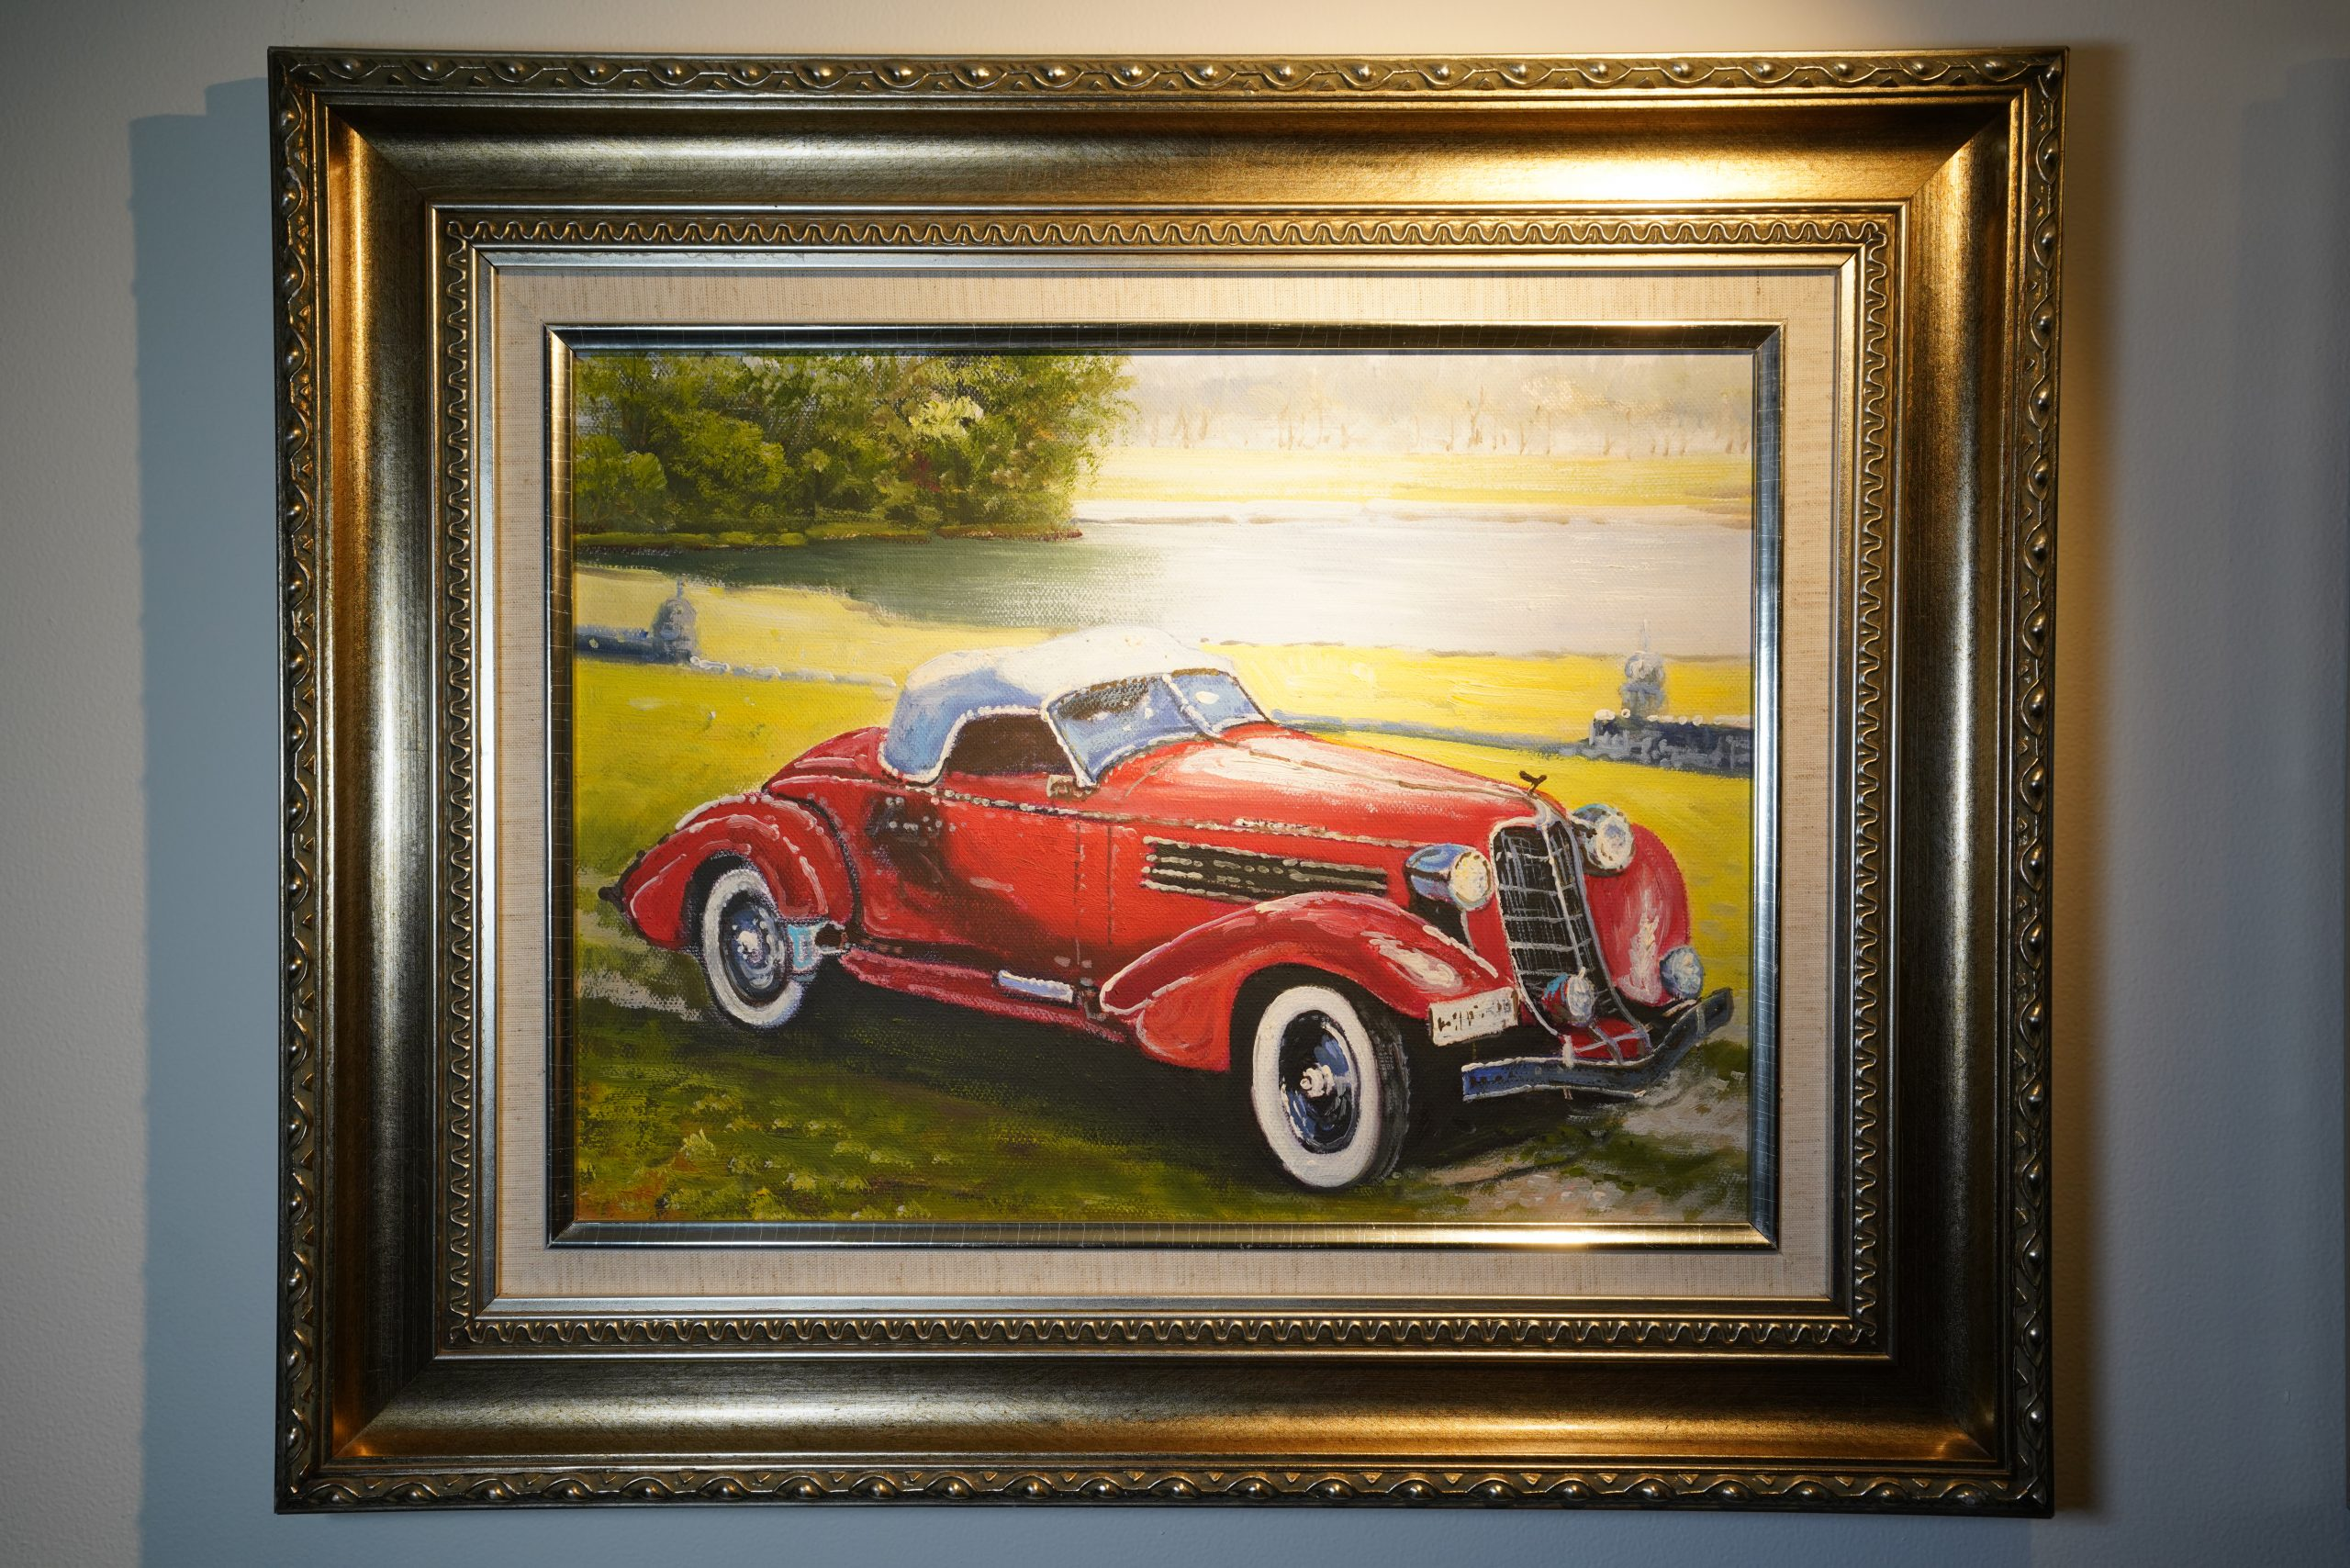 Car painting frame